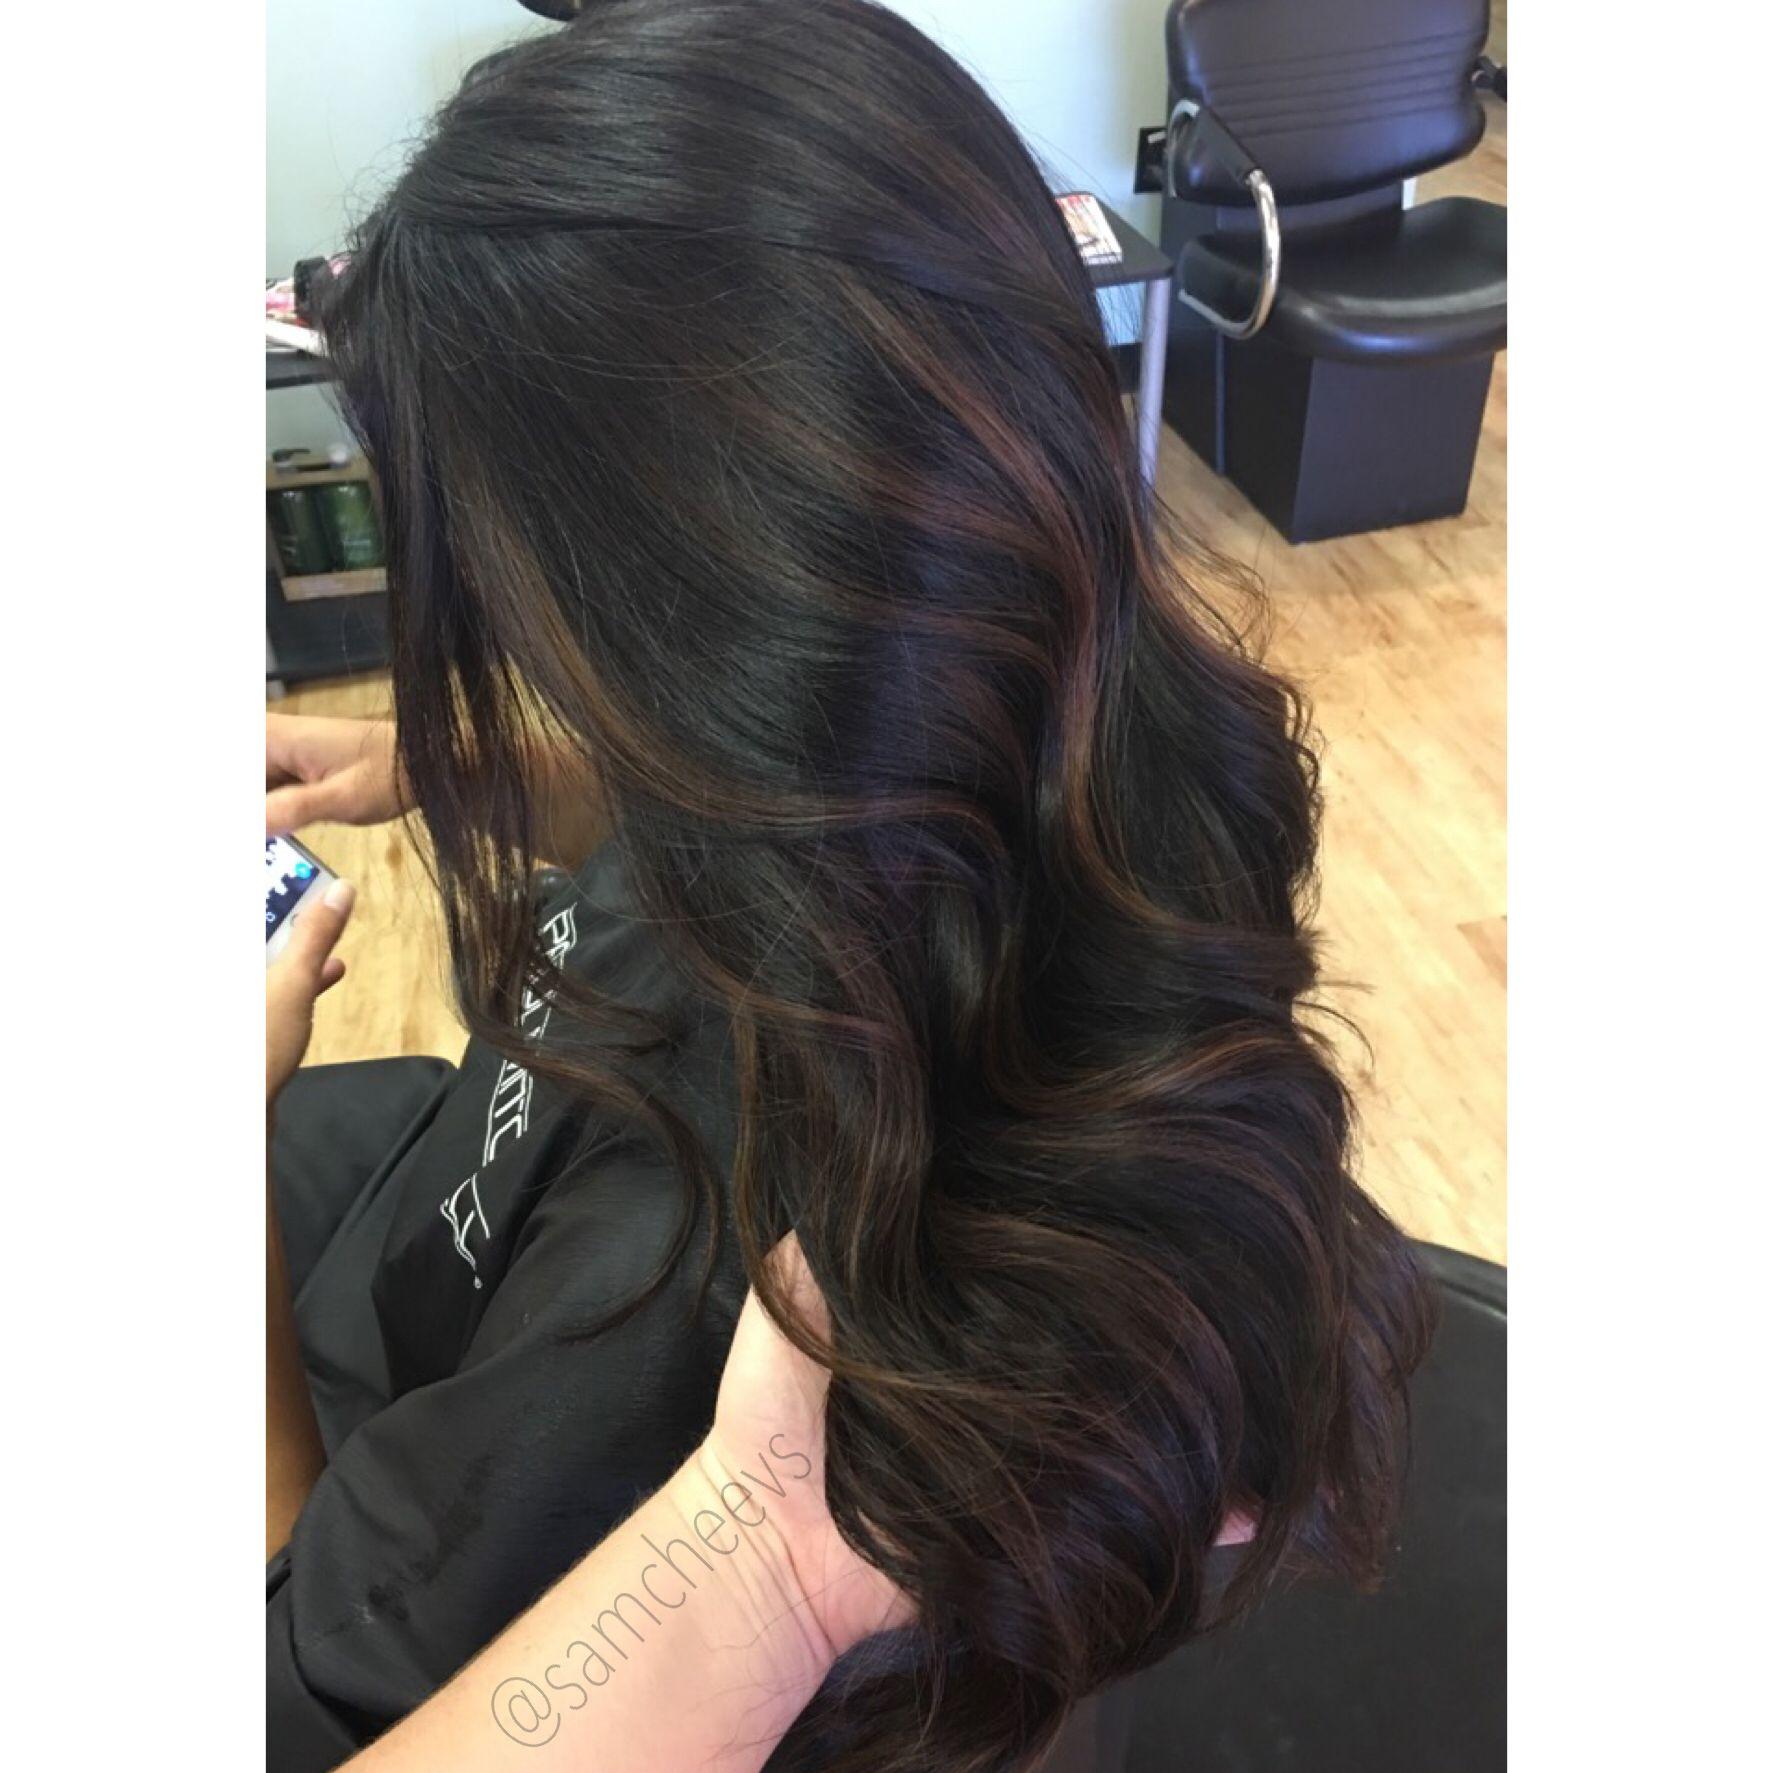 Caramel highlights for dark hair brown balayage for black hair